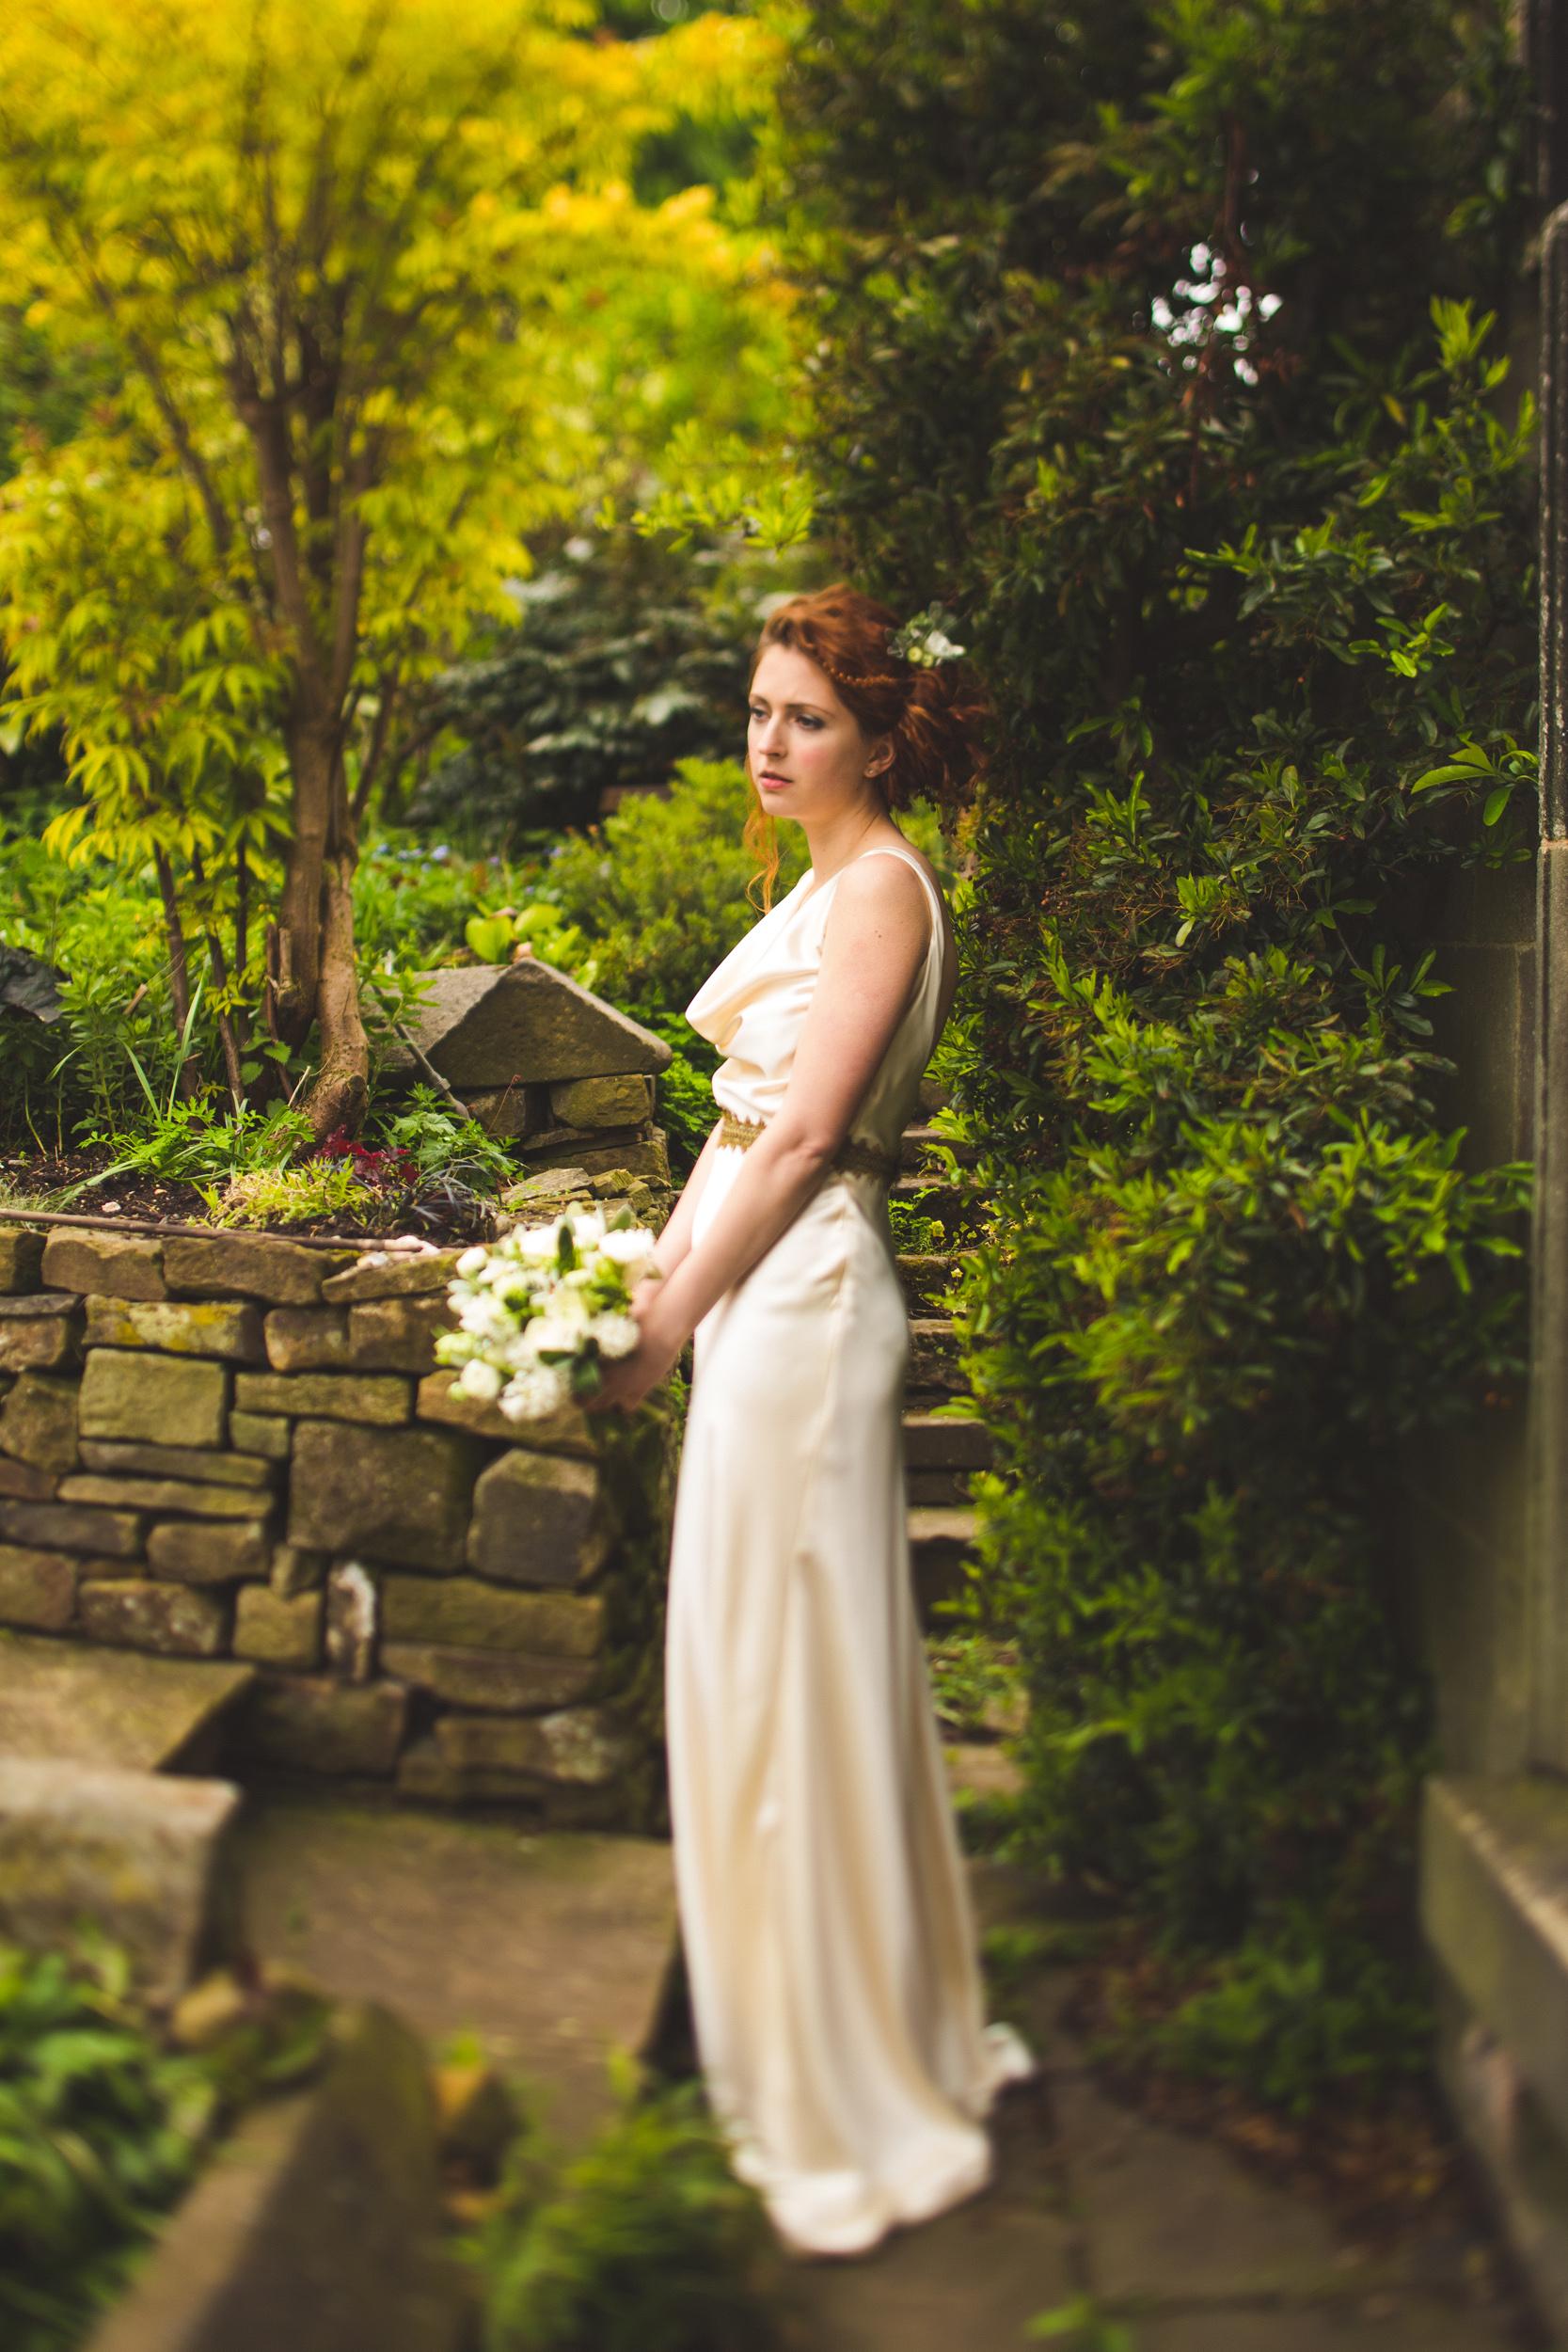 kate-beaumont-vintage-inspired-bridal-wedding-dresses-Sheffield-S6-16.jpg